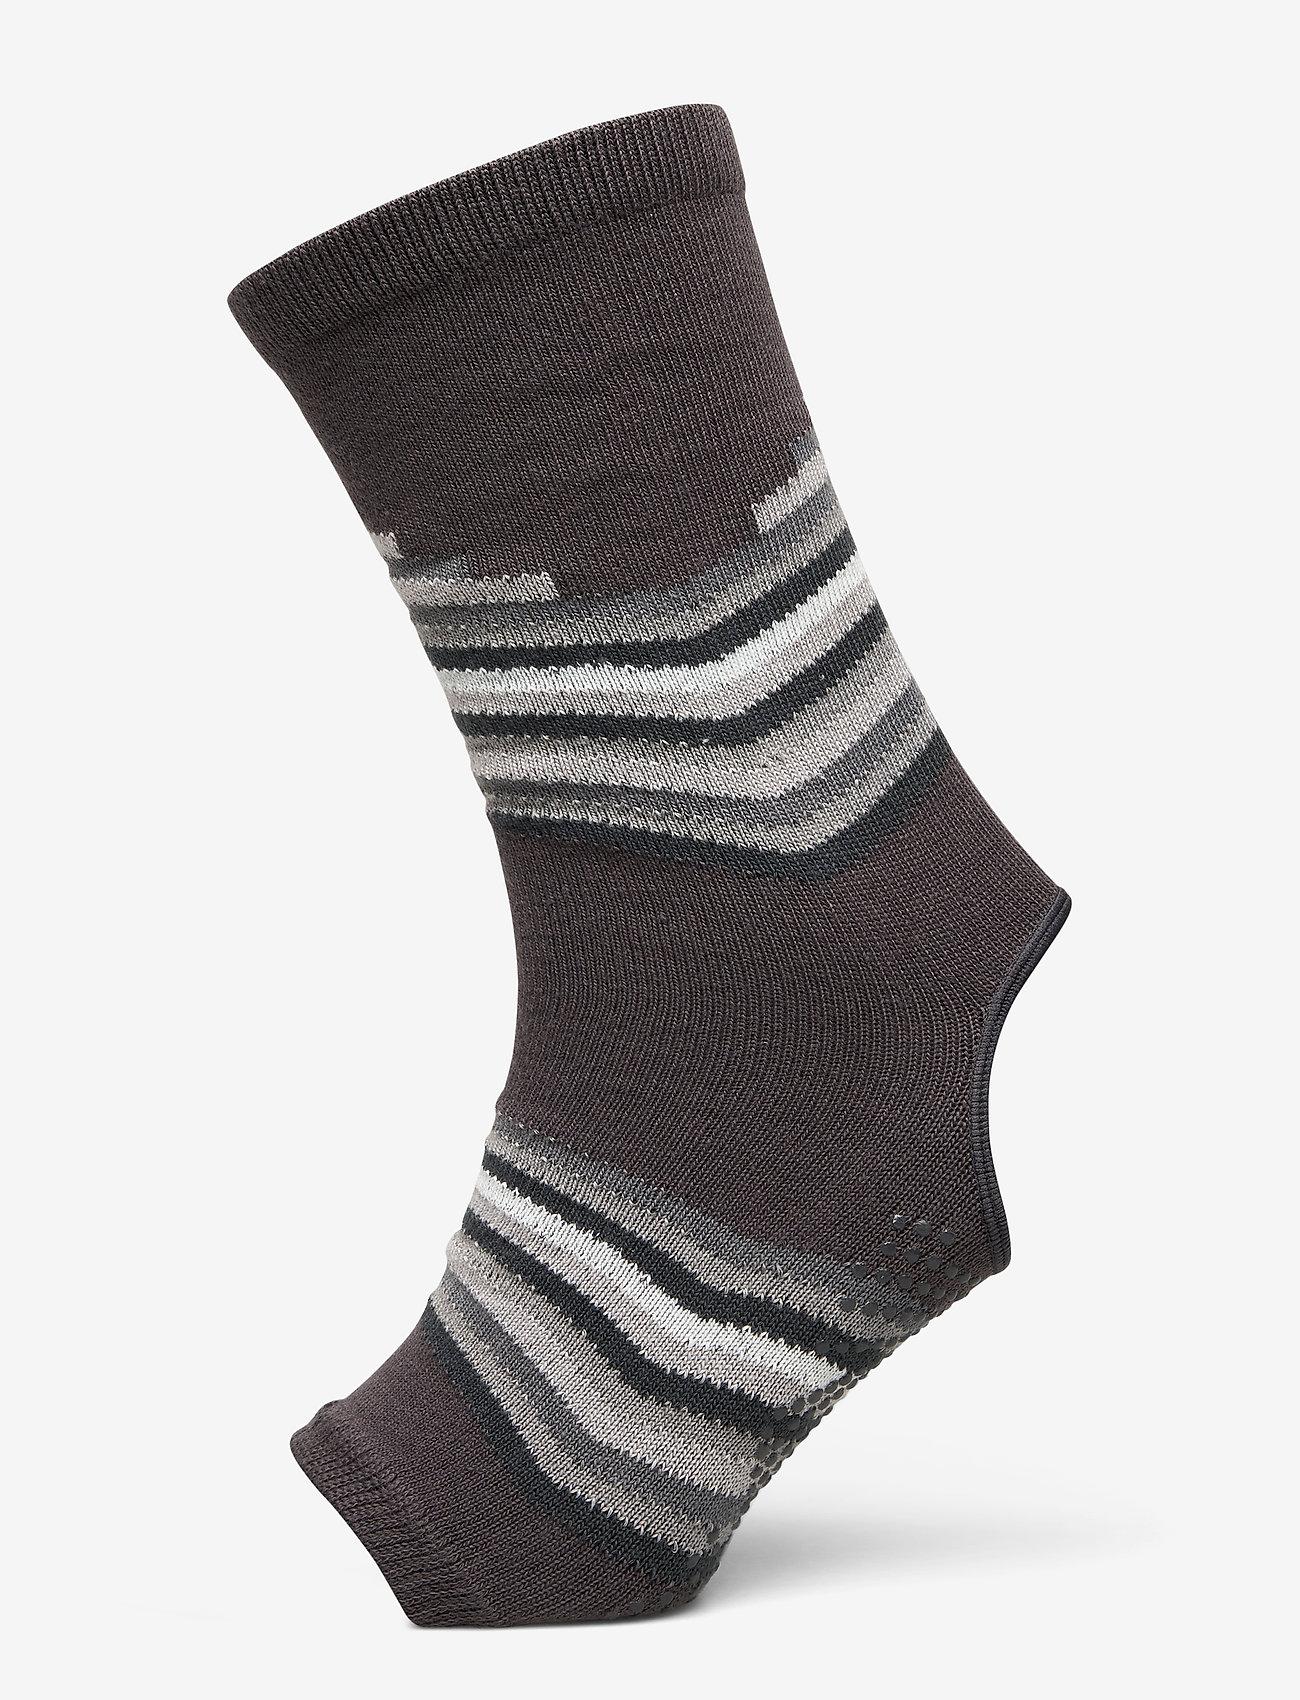 Gaiam - Grippy Yoga Anklets Smoky Grey - yogamatten & uitrusting - smokey grey - 1